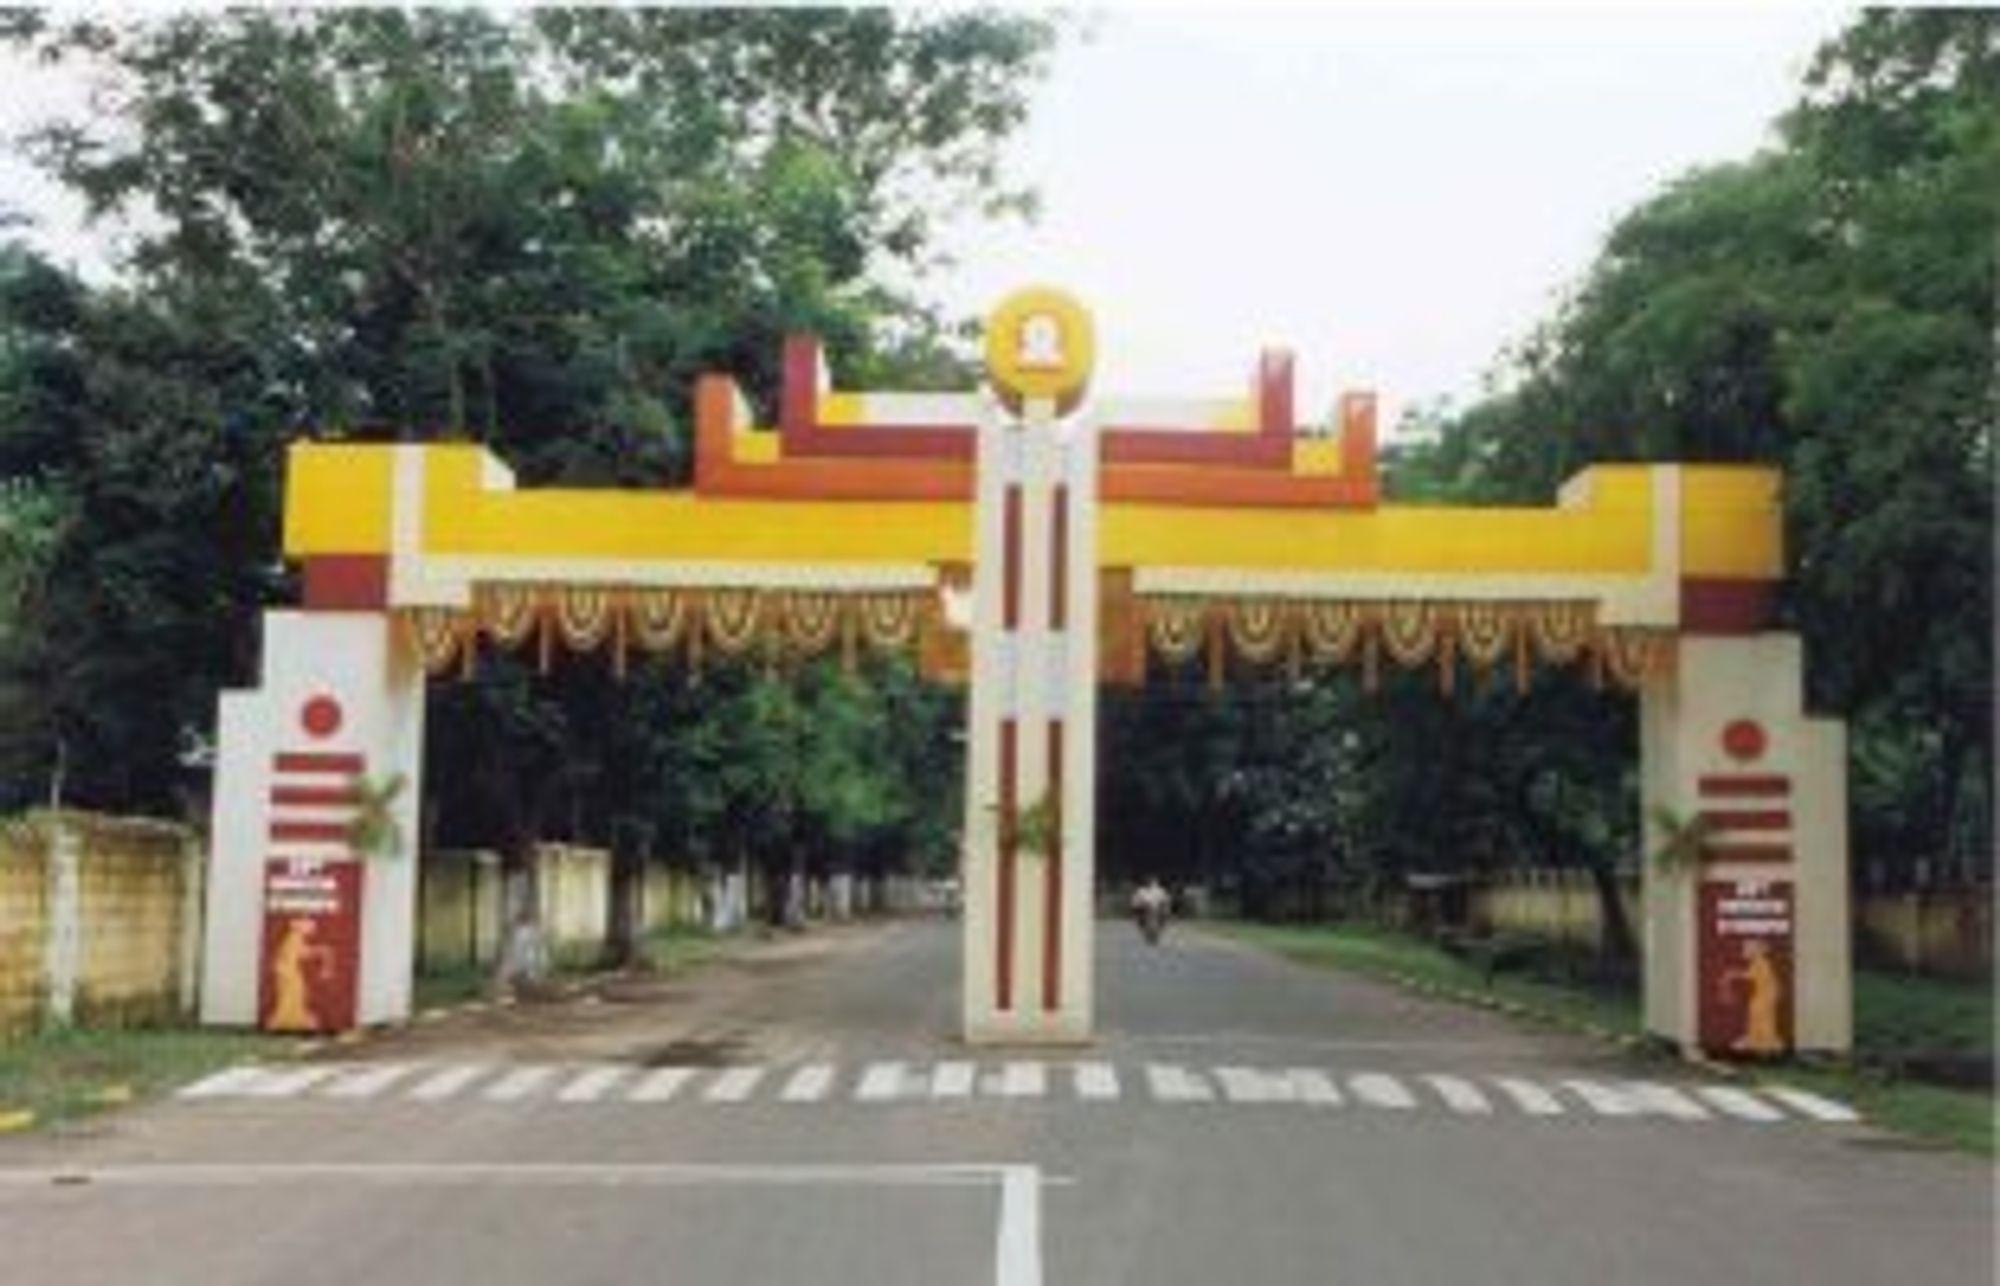 Inngangsparetiet til universitetet Kharagpur likner lite på Gløshaugen. Foto: Universitete i Kharagpur